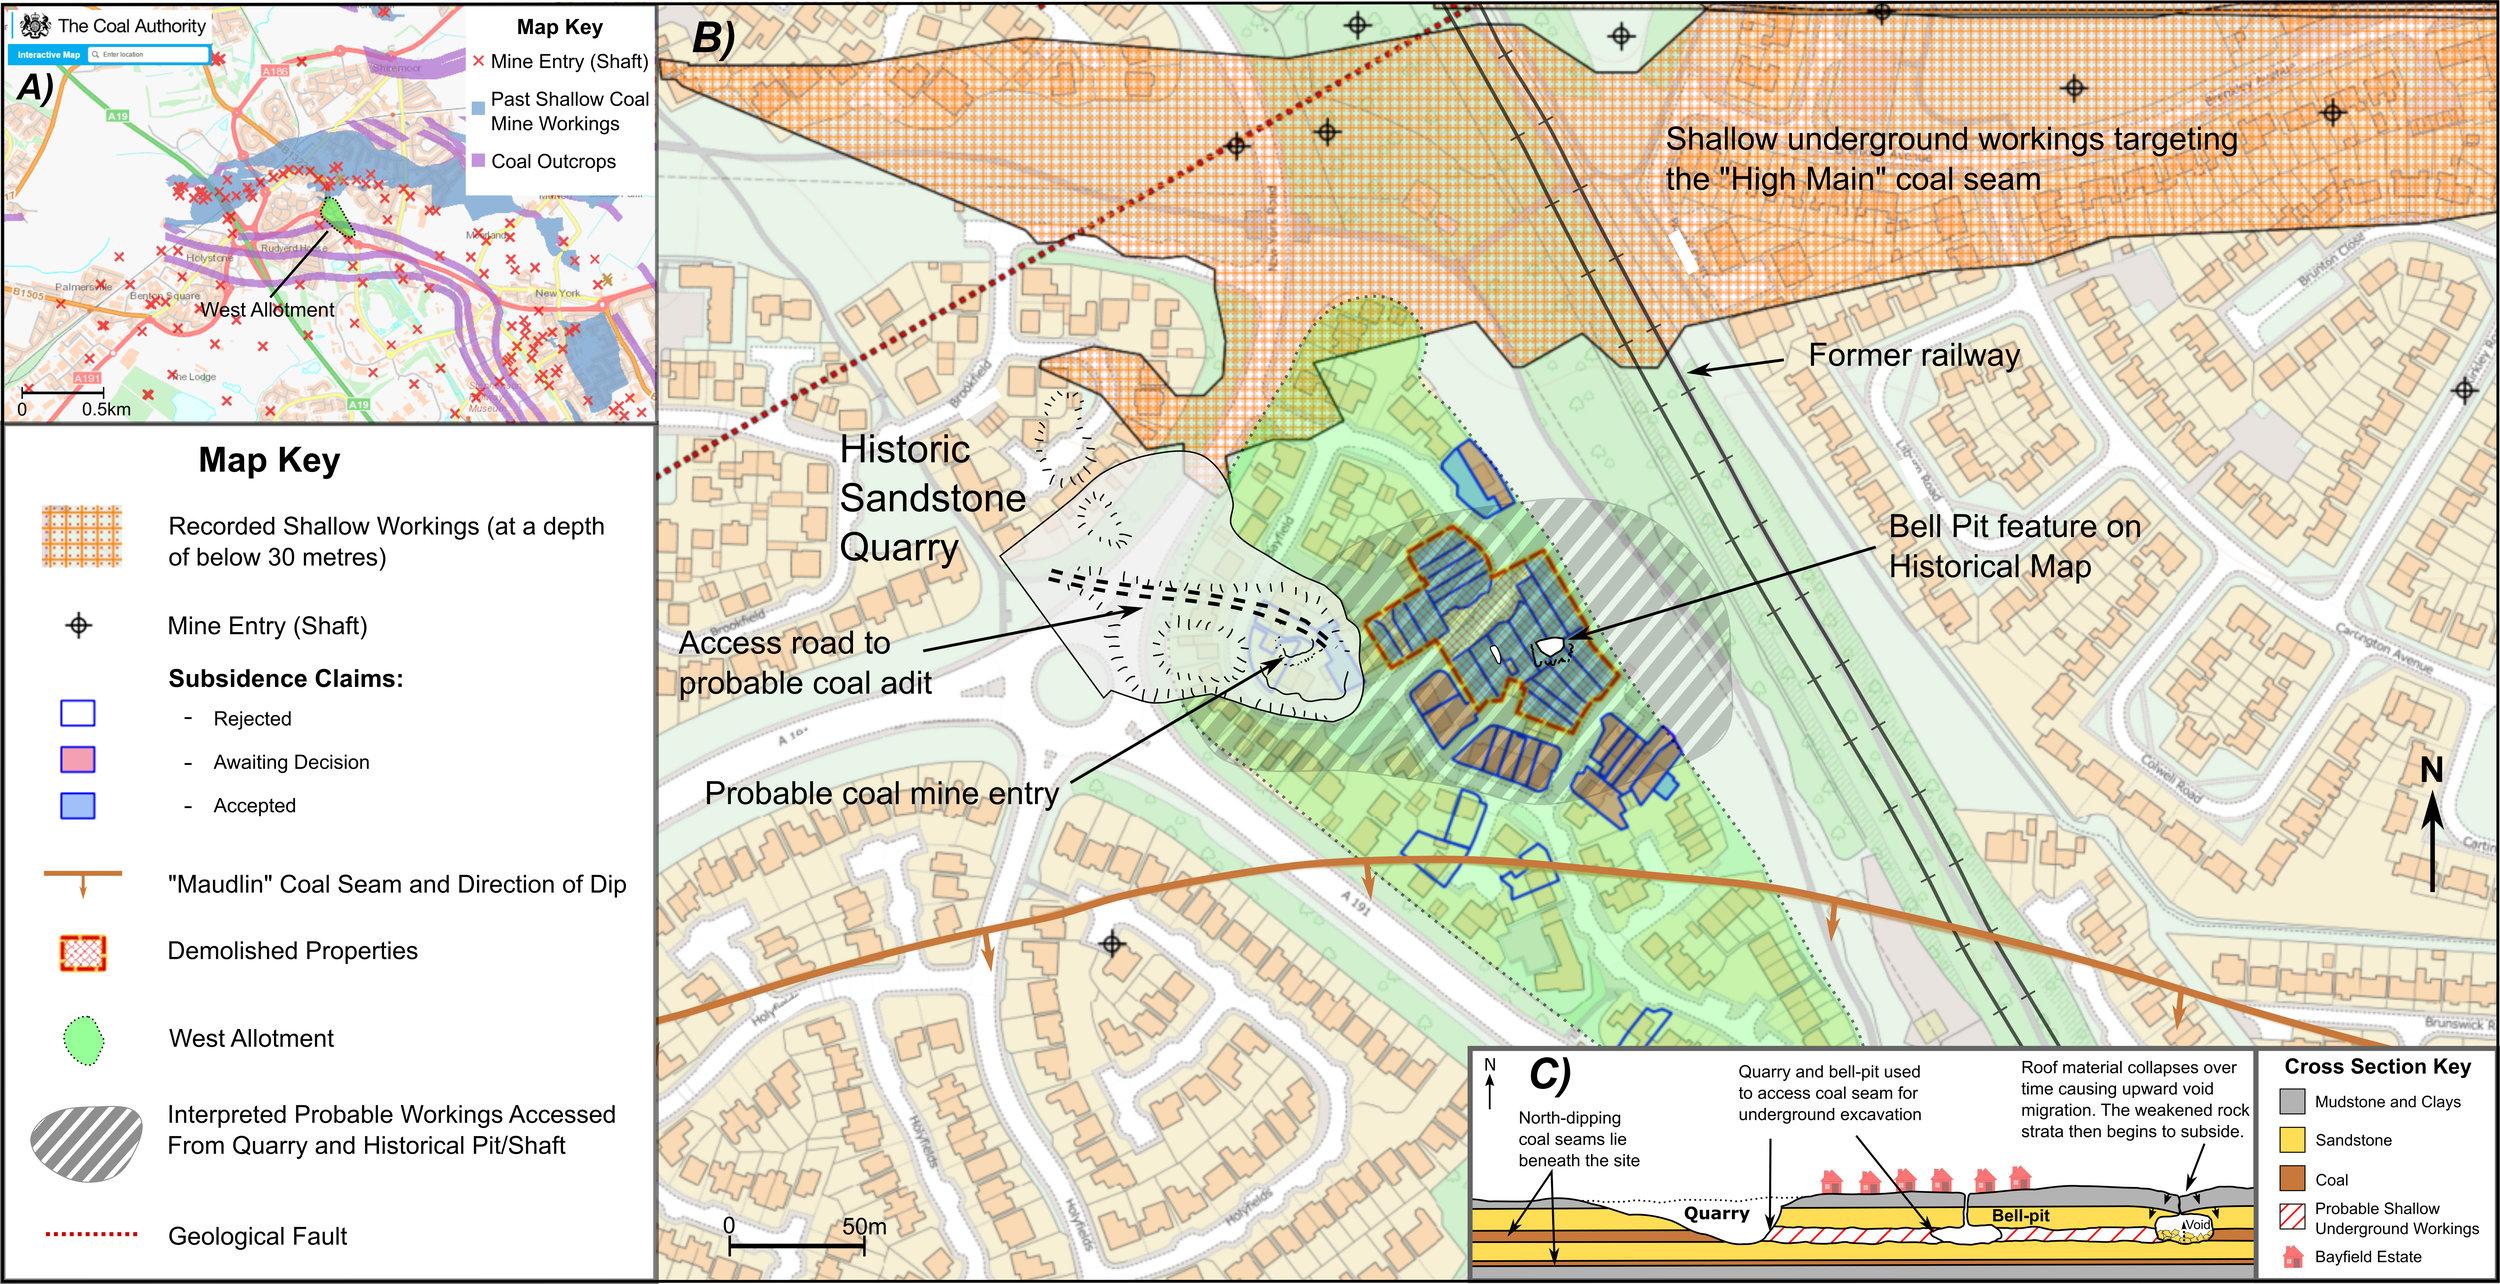 Figure 1: Terrafirma desk study assessment of shallow mining hazard at Bayfield Estate